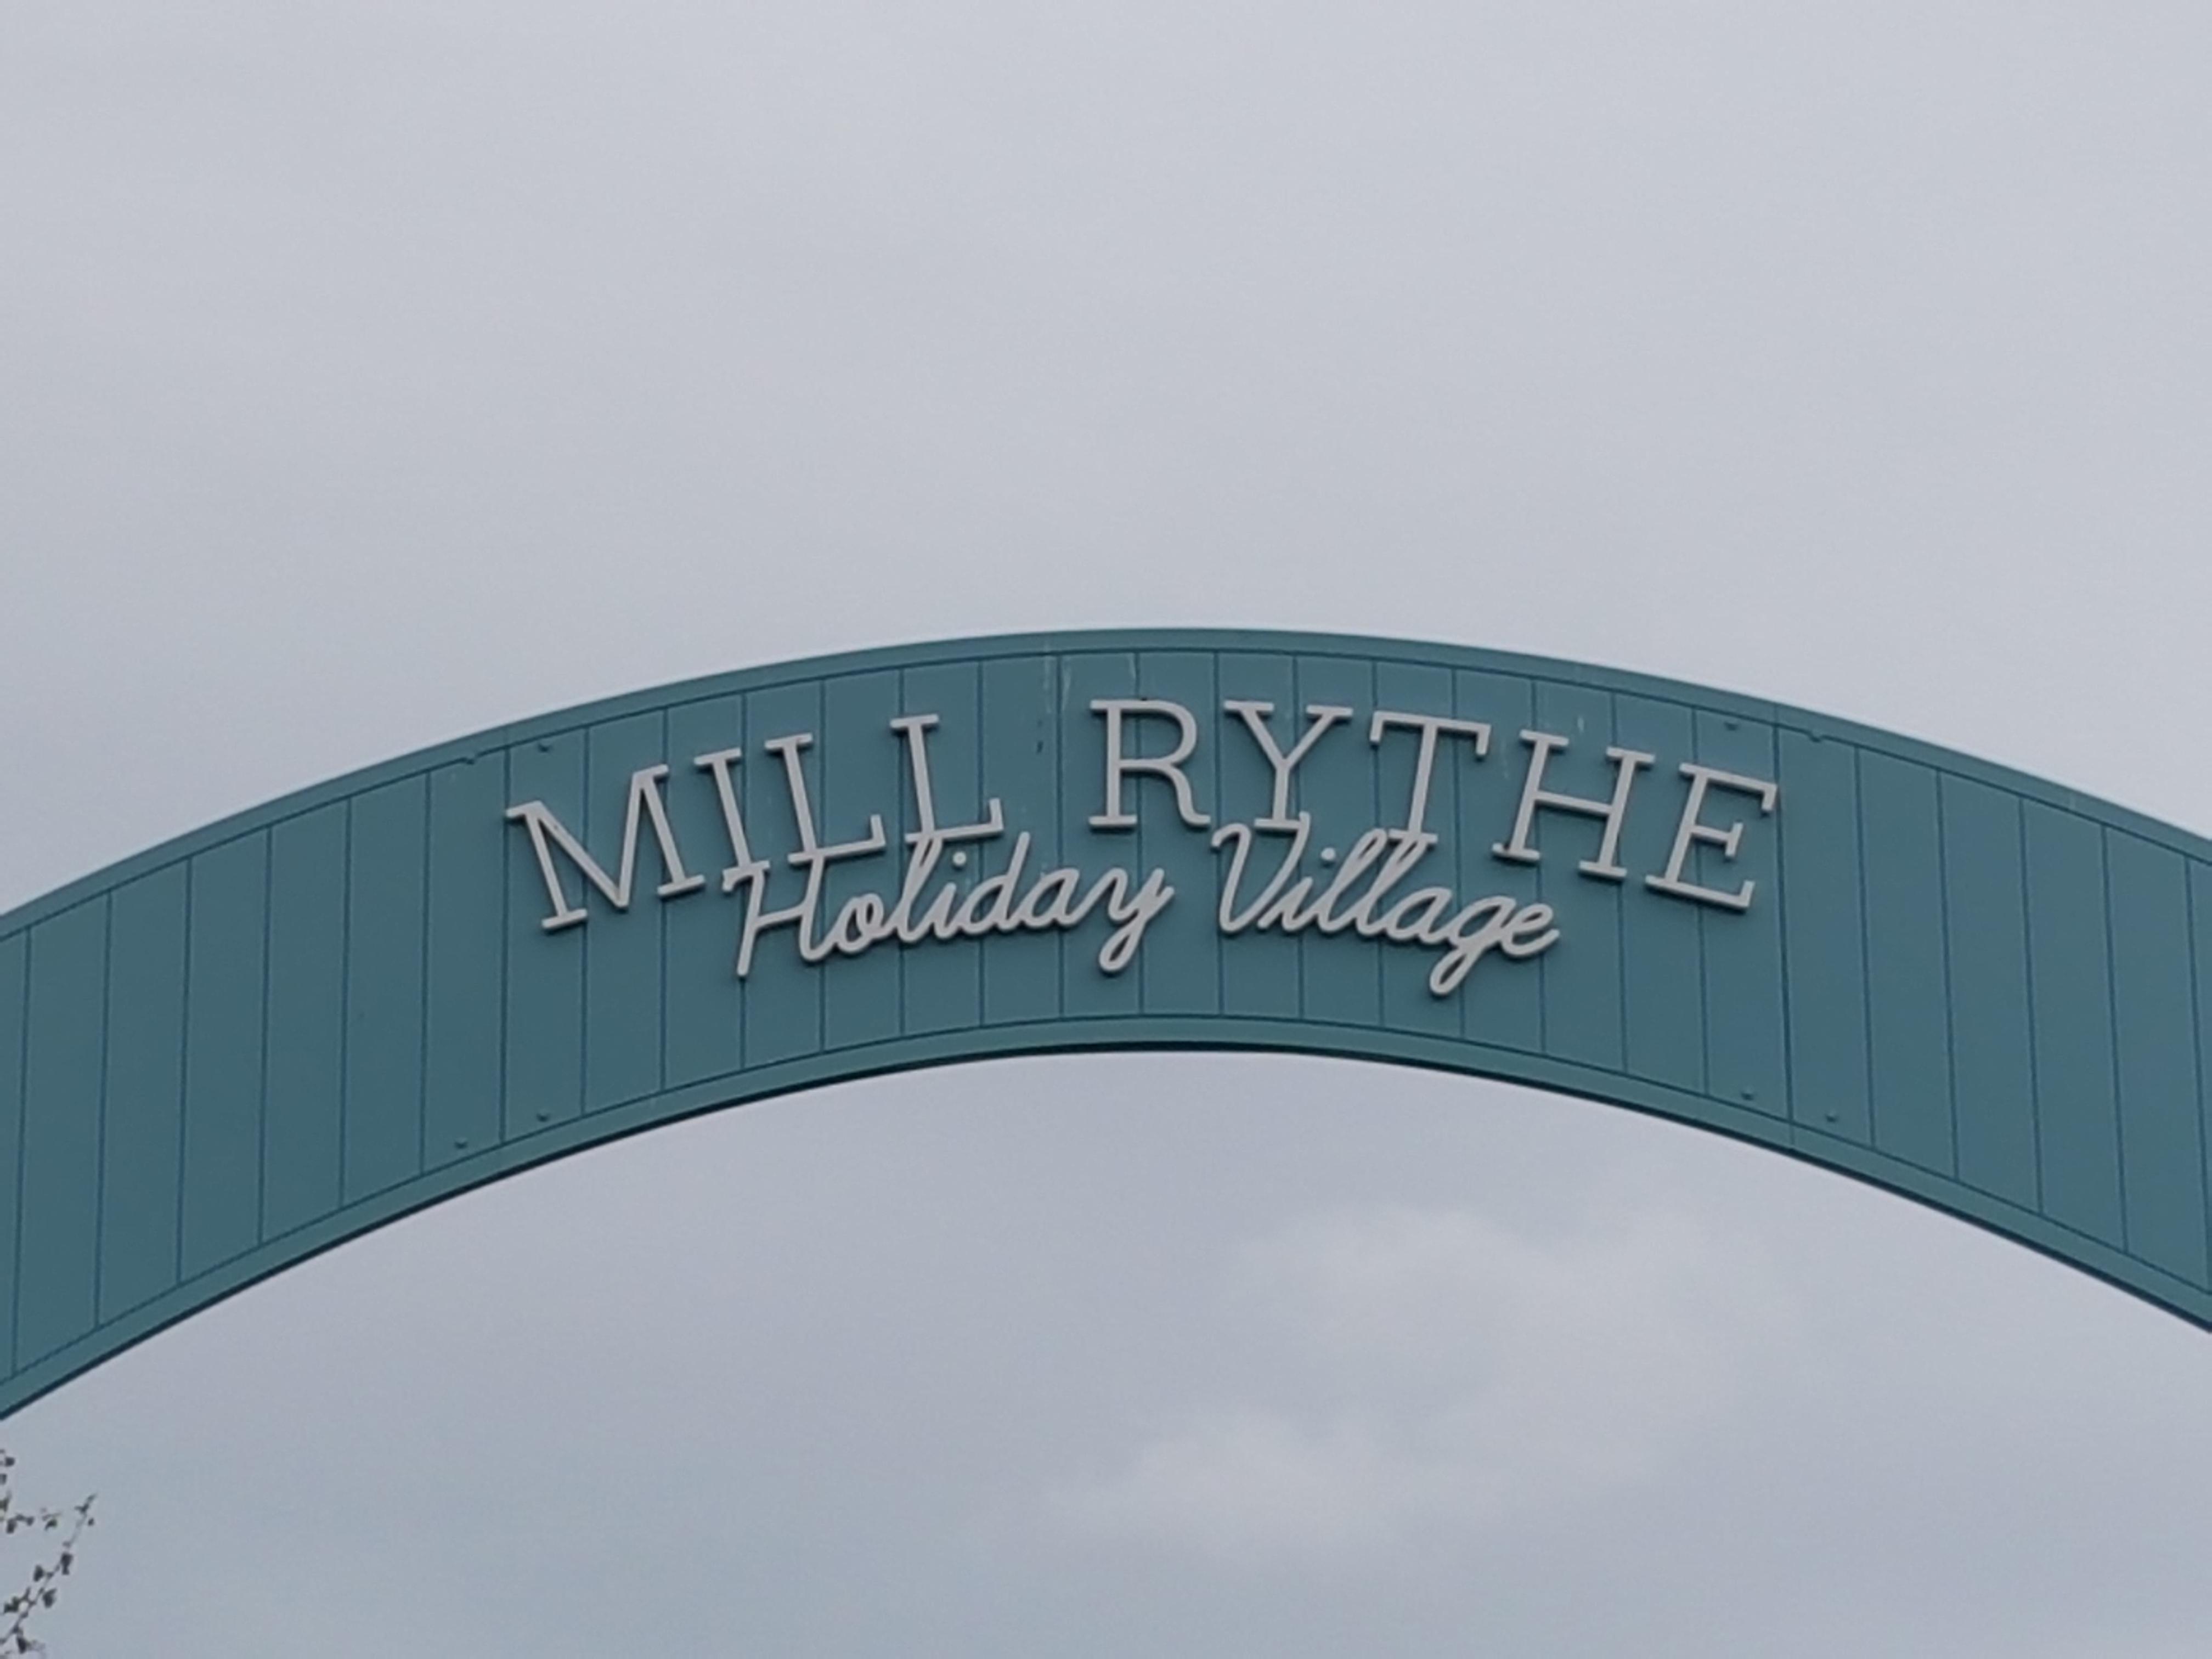 Mill Rythe